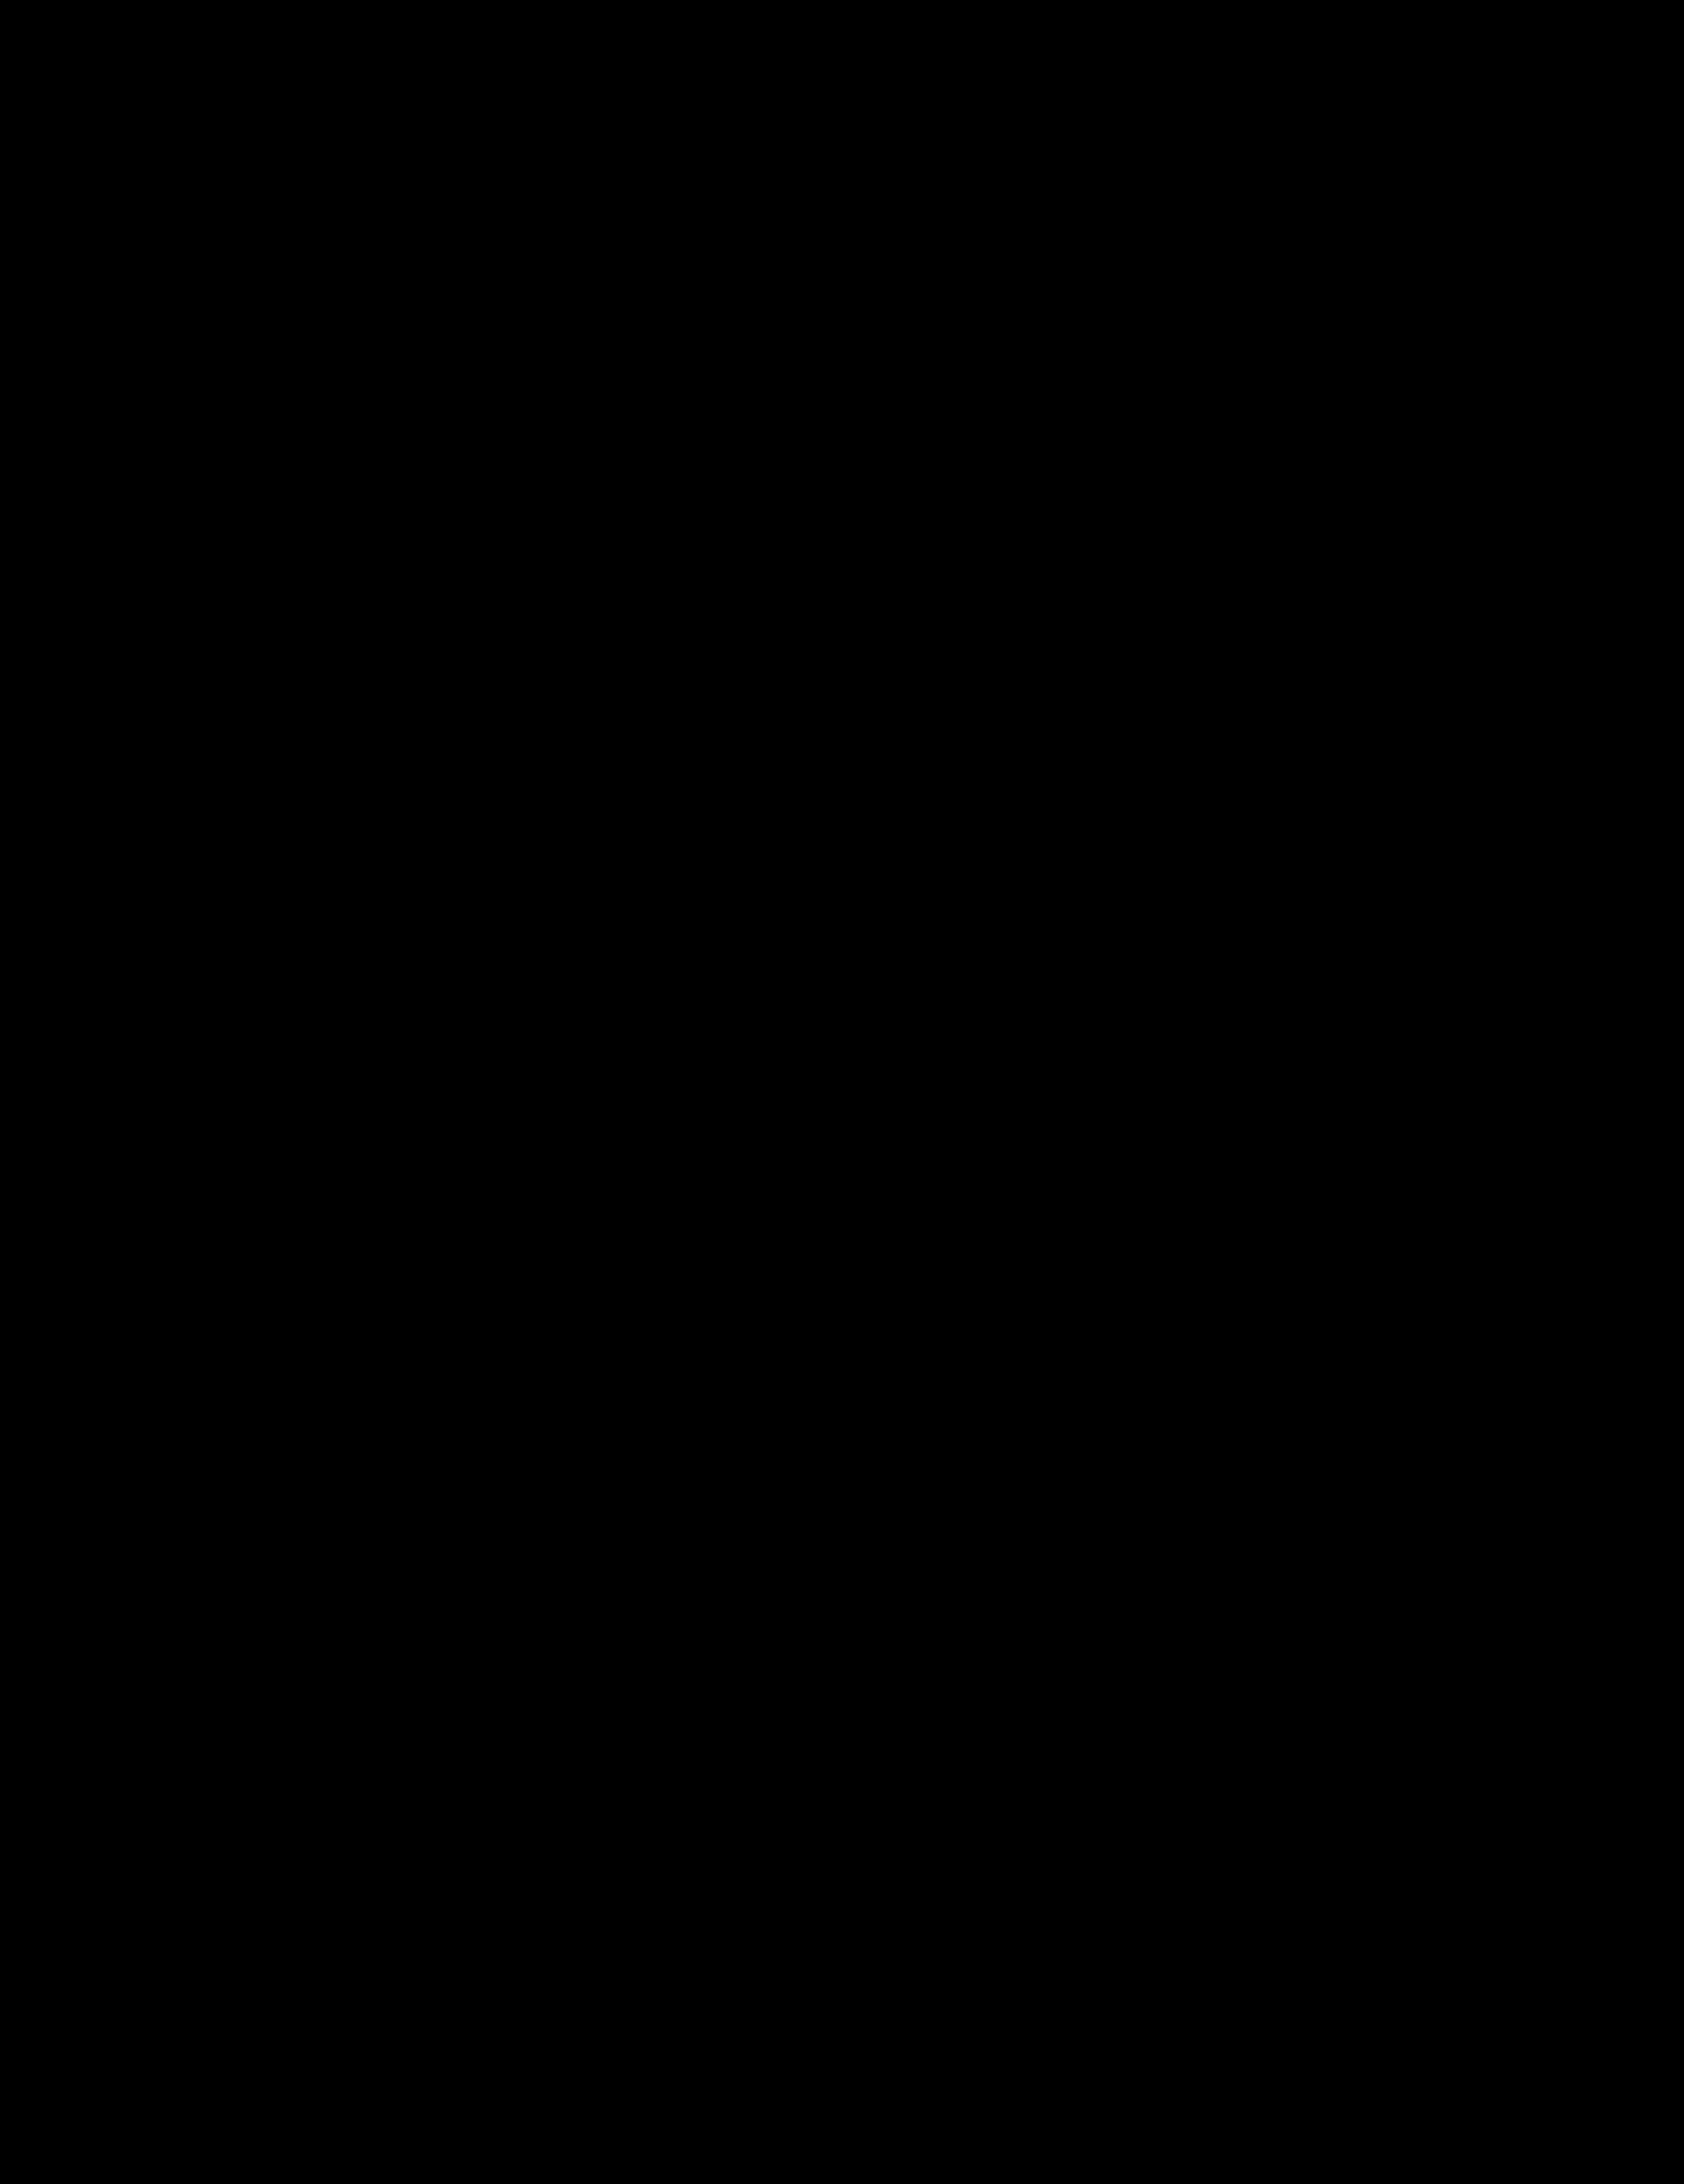 Clipart Bold Zodiac Symbols